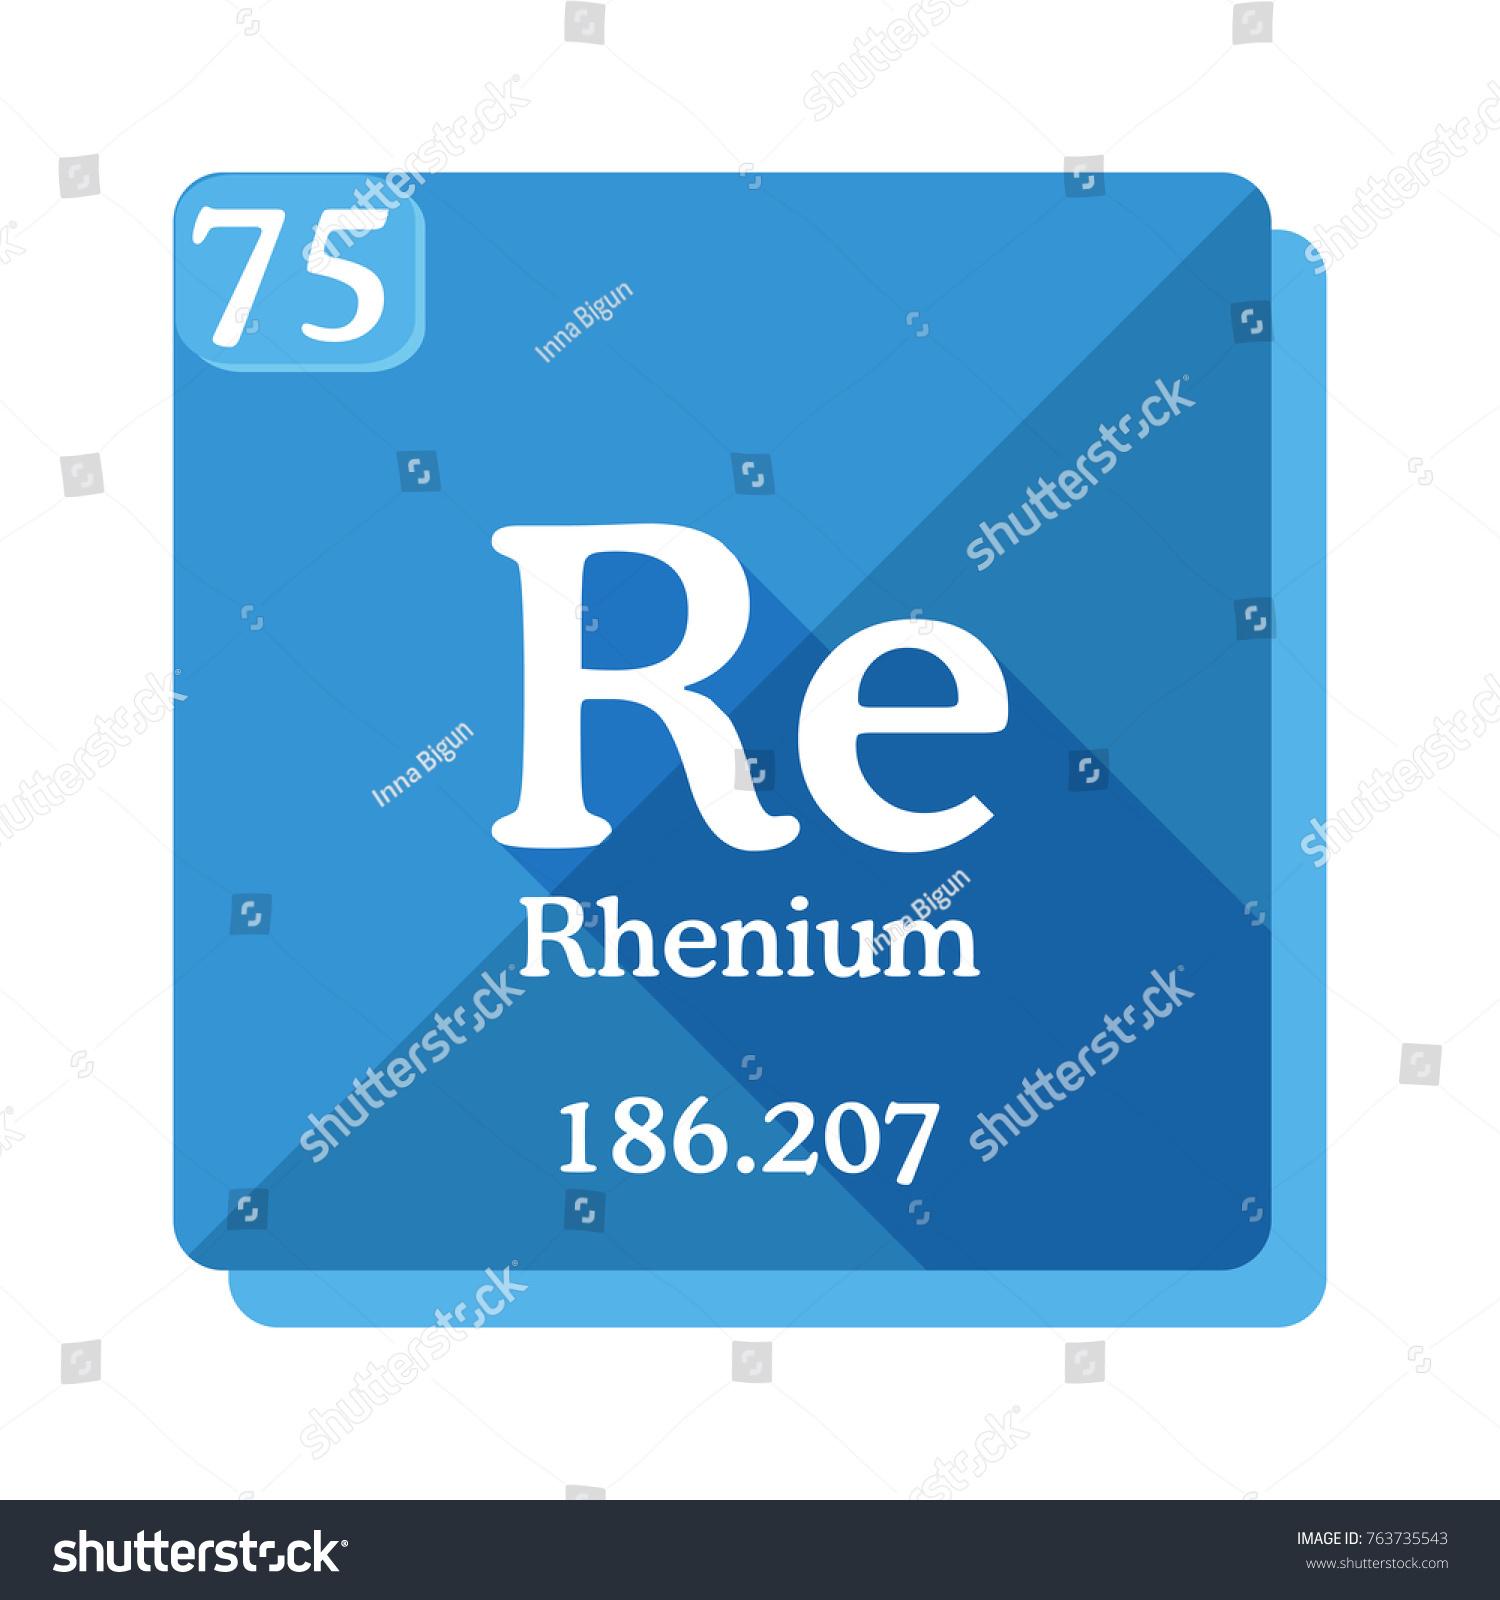 Periodic table re images periodic table images re element periodic table image collections periodic table images rhenium re element periodic table vector stock gamestrikefo Choice Image